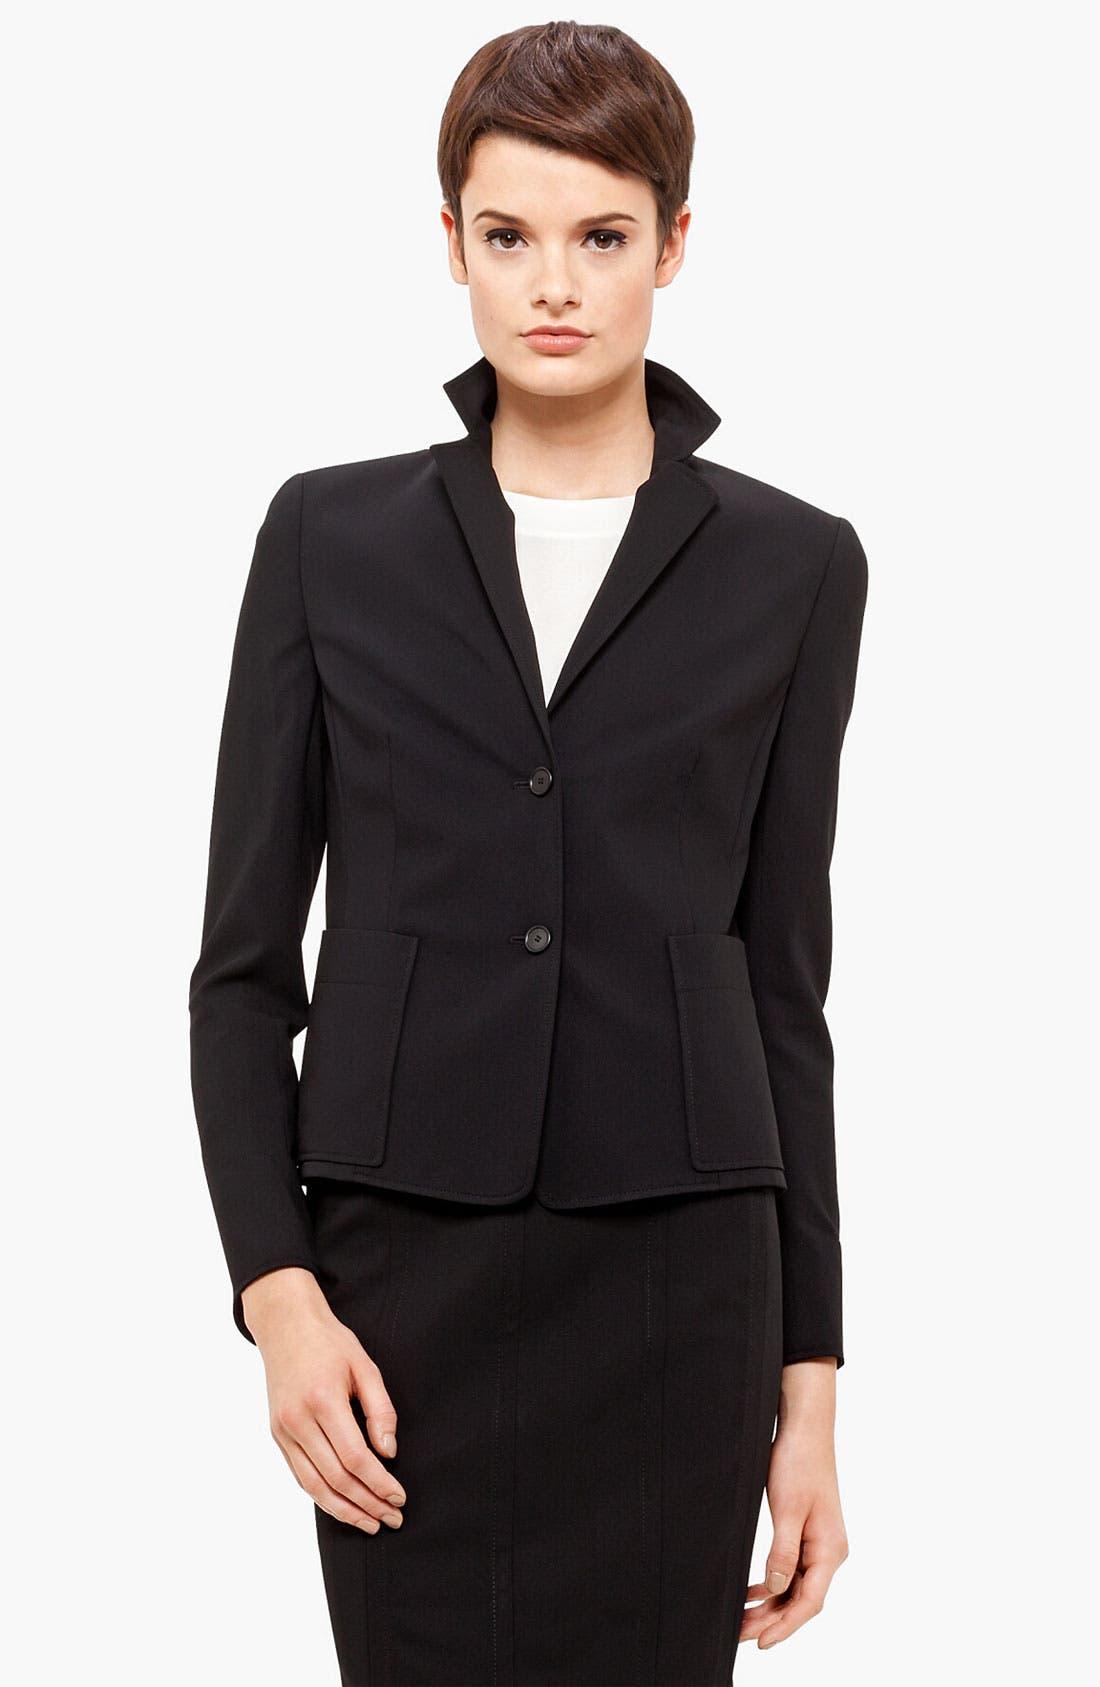 Alternate Image 1 Selected - Akris punto Two Button Wool Jacket